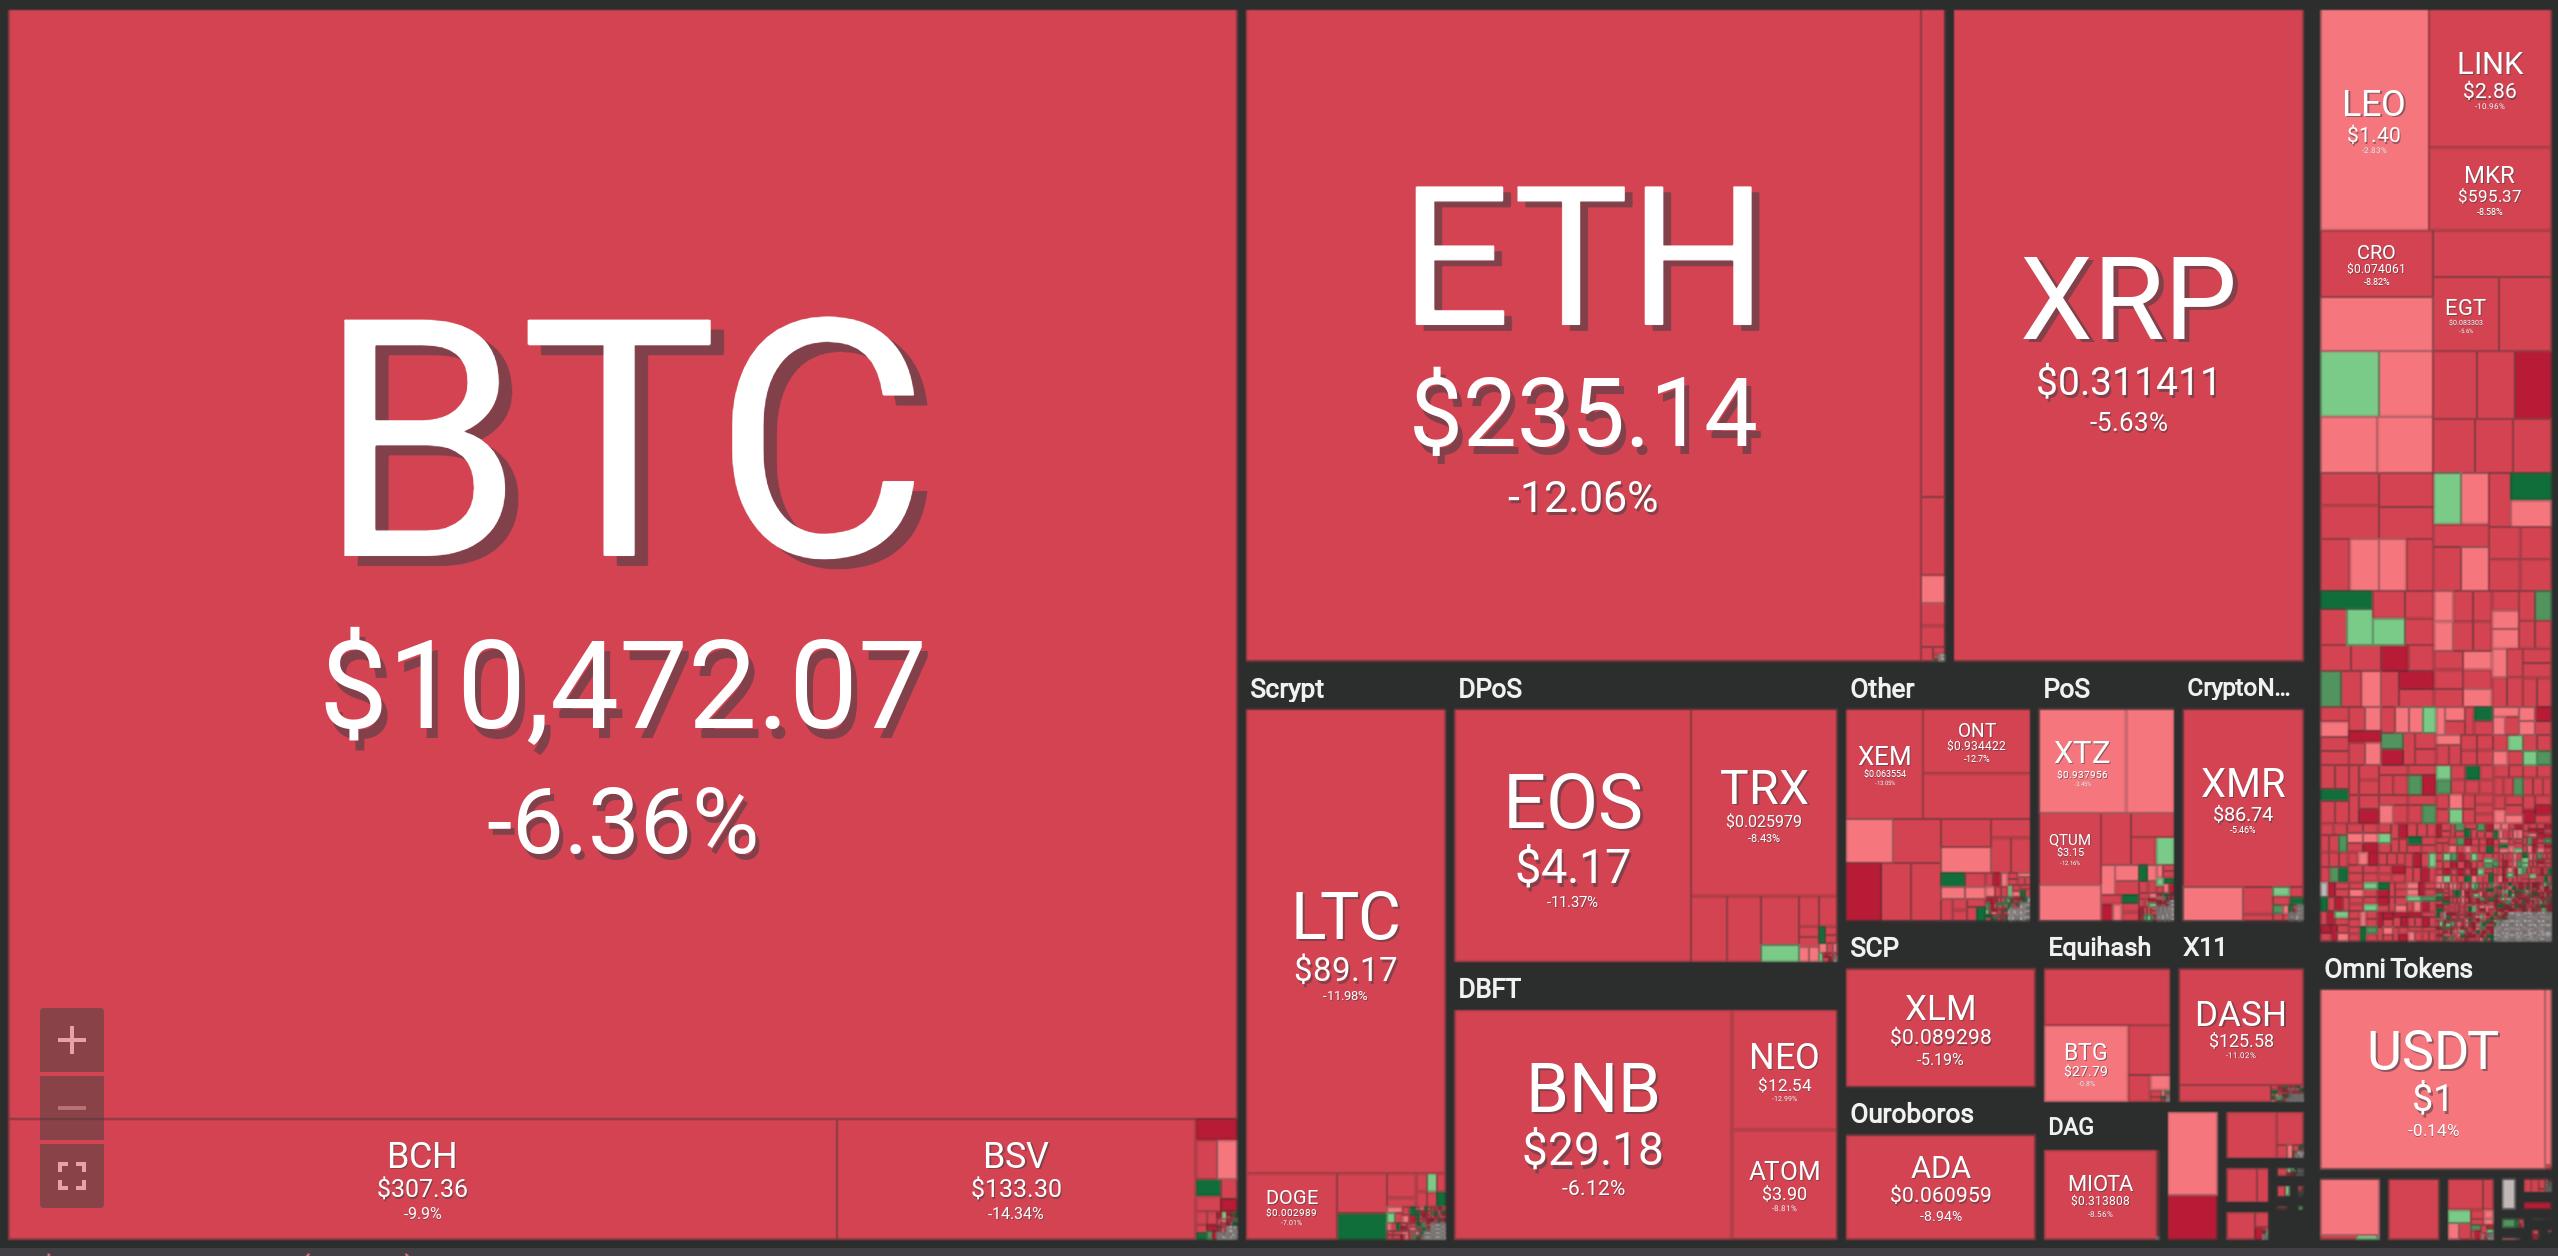 Bitcoin Dip or Doom? Analysts Diverge As Crypto Market Plummets  Billion – BTC, Ethereum, XRP, Litecoin, Bitcoin Cash Forecasts